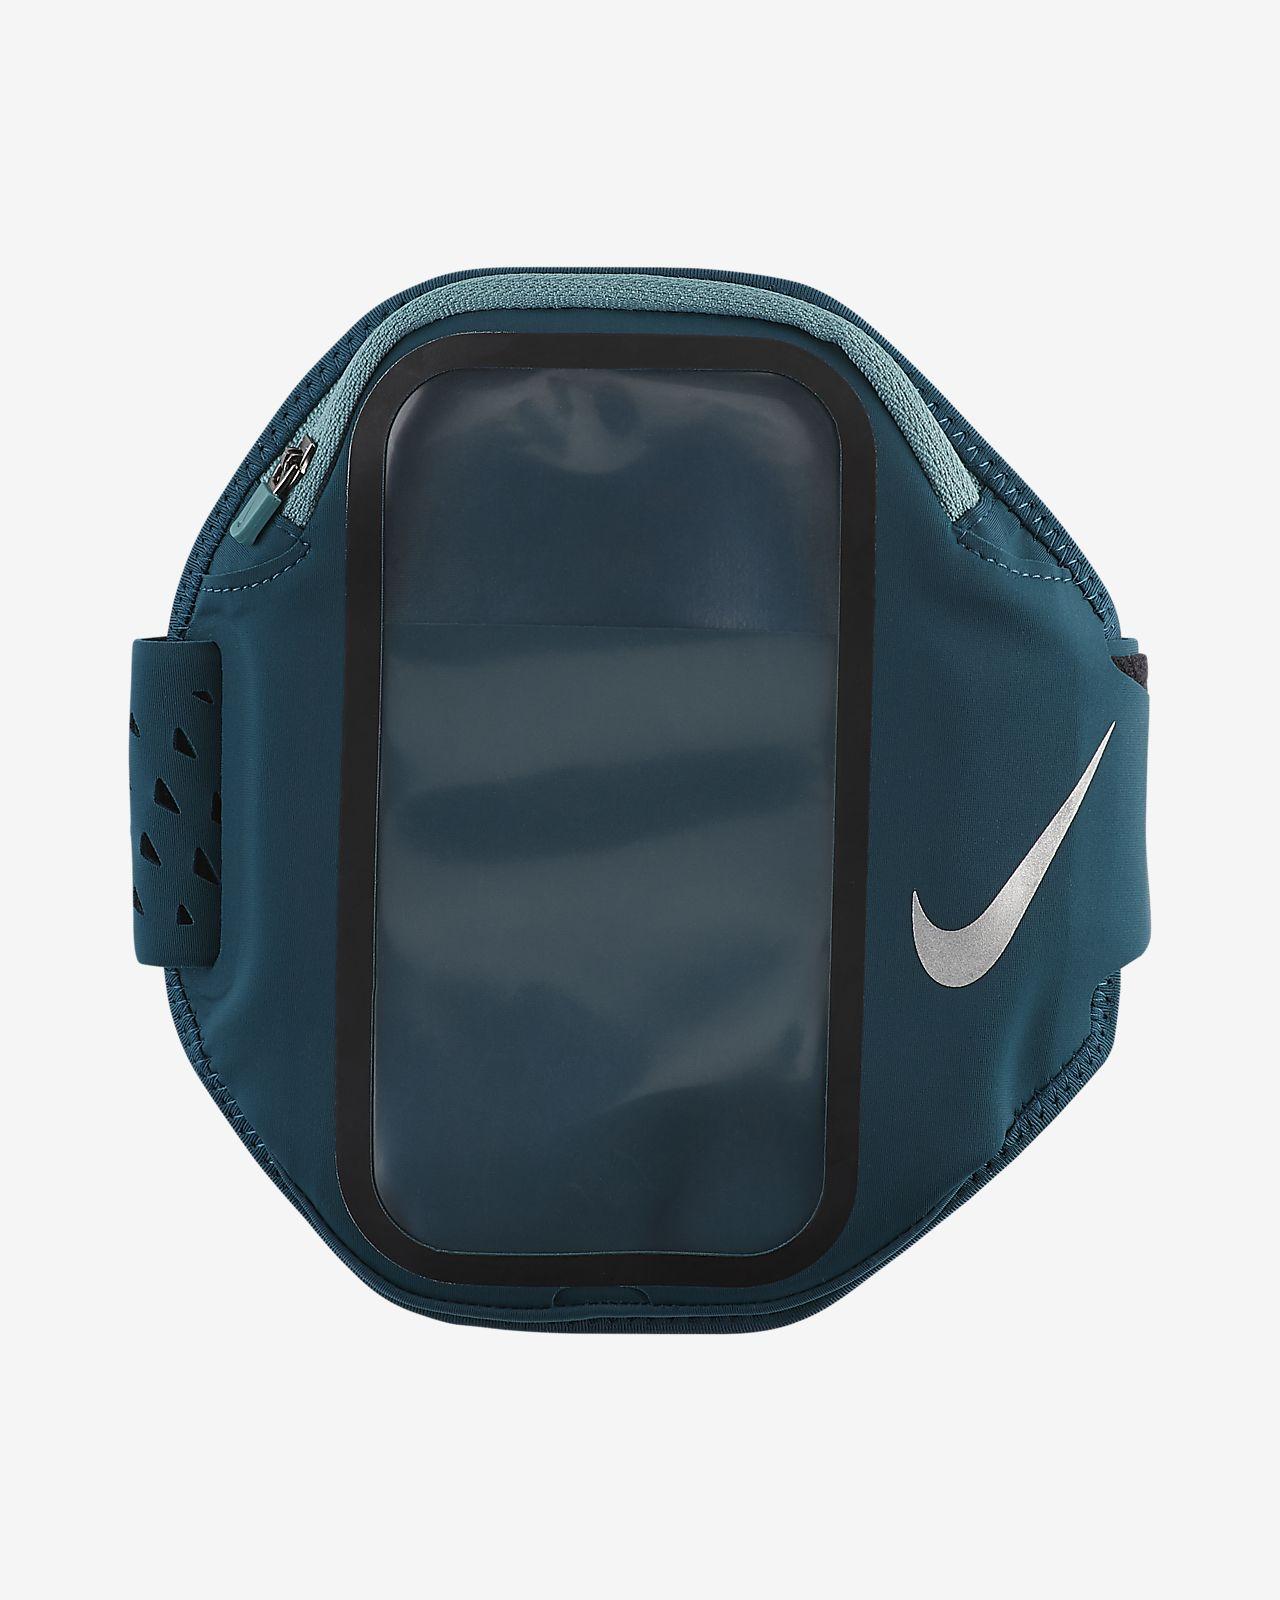 Pouzdro na ruku Nike Plus s kapsou